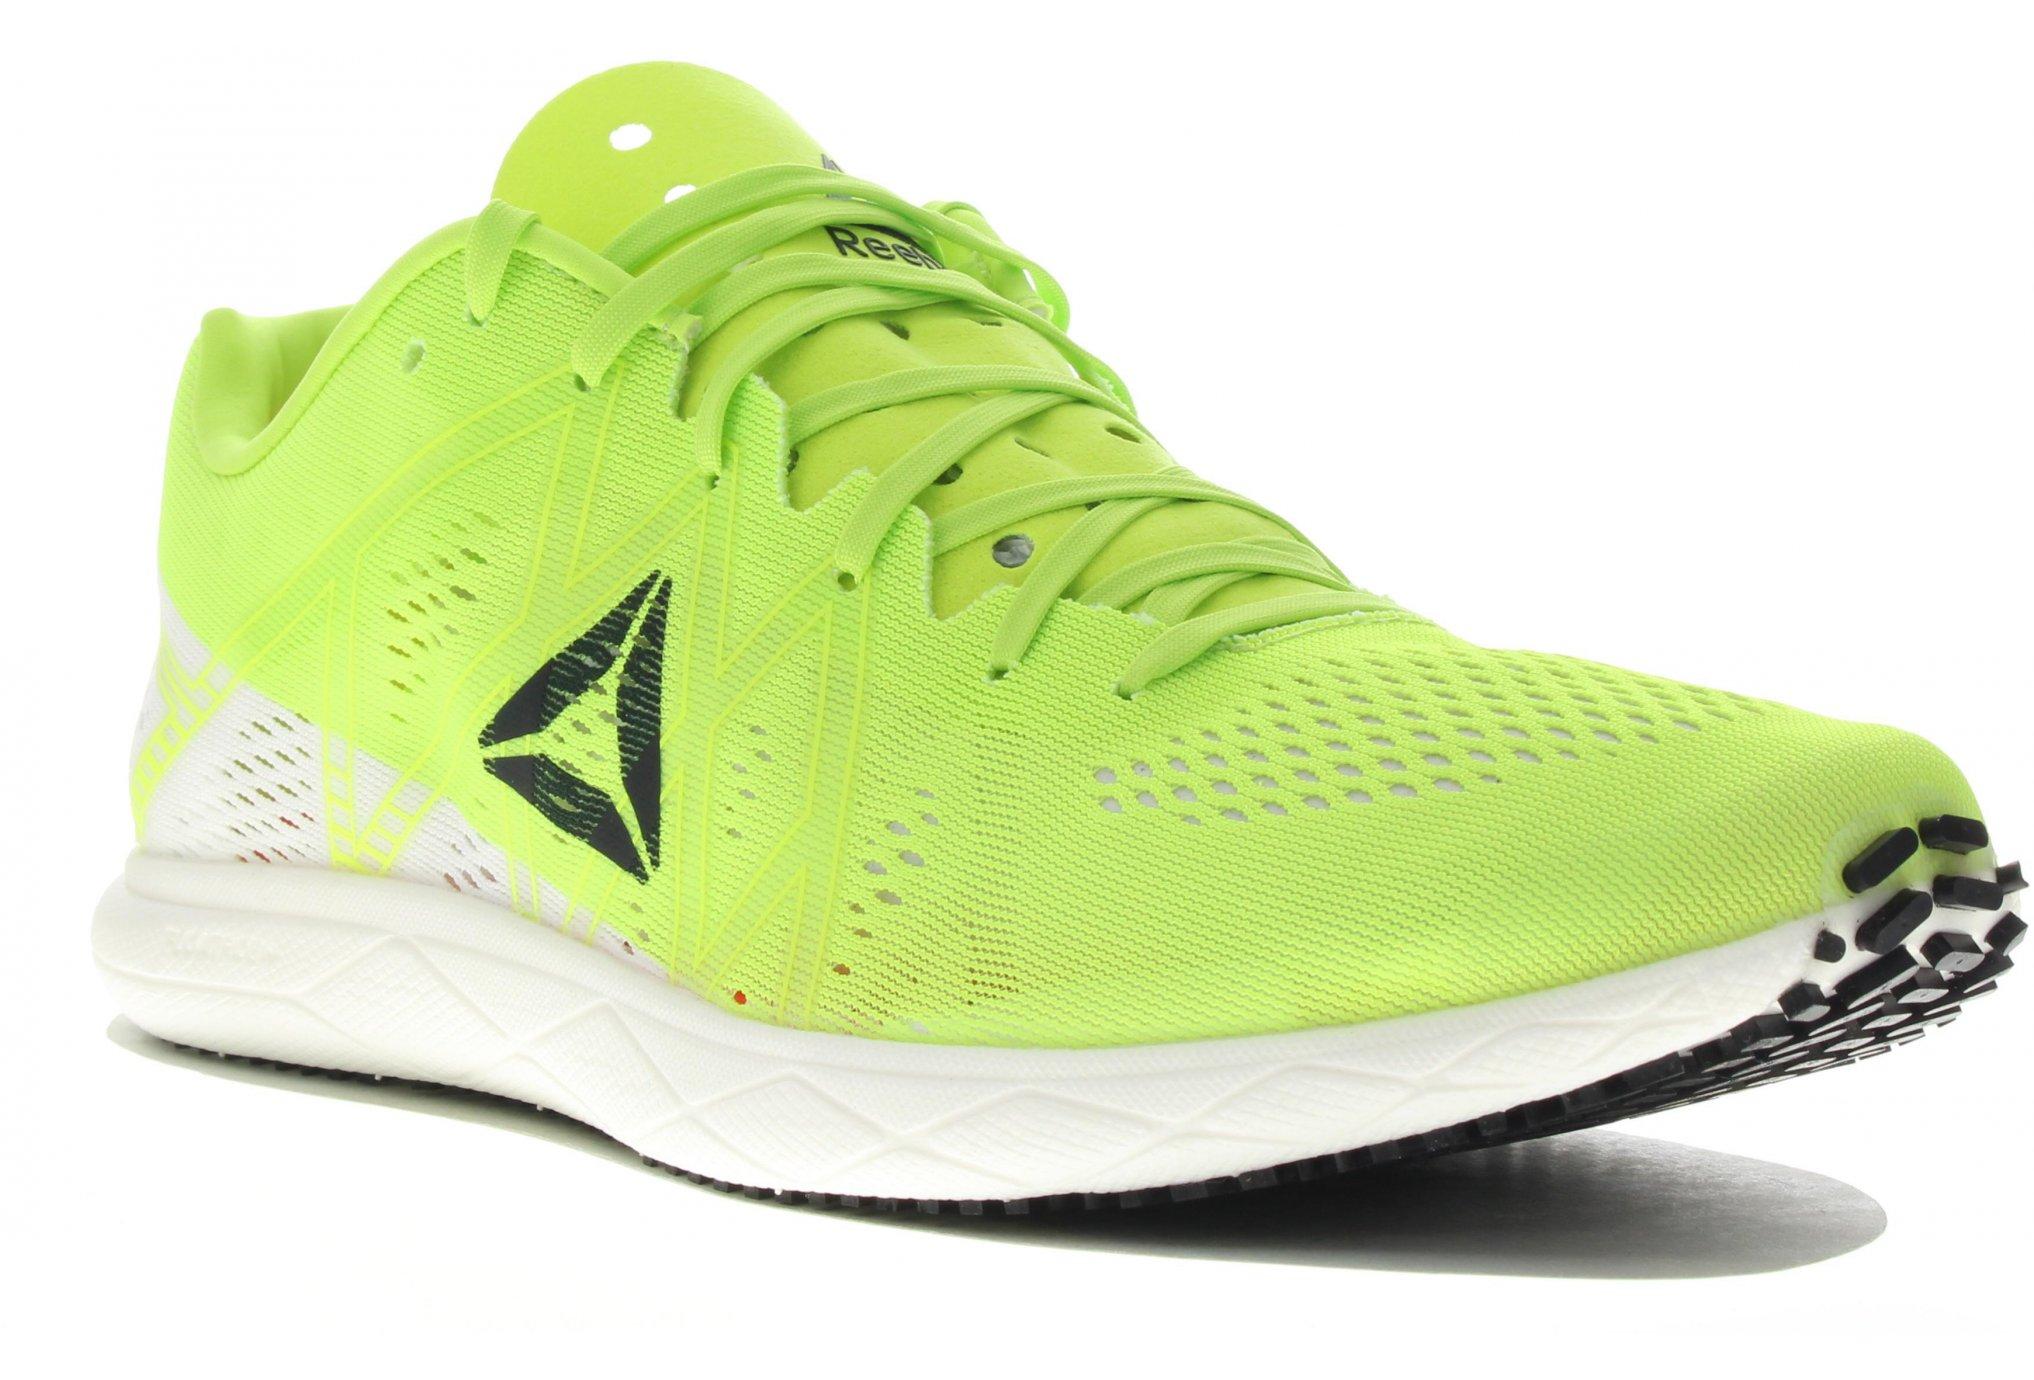 Reebok Floatride Run Fast Pro Chaussures homme